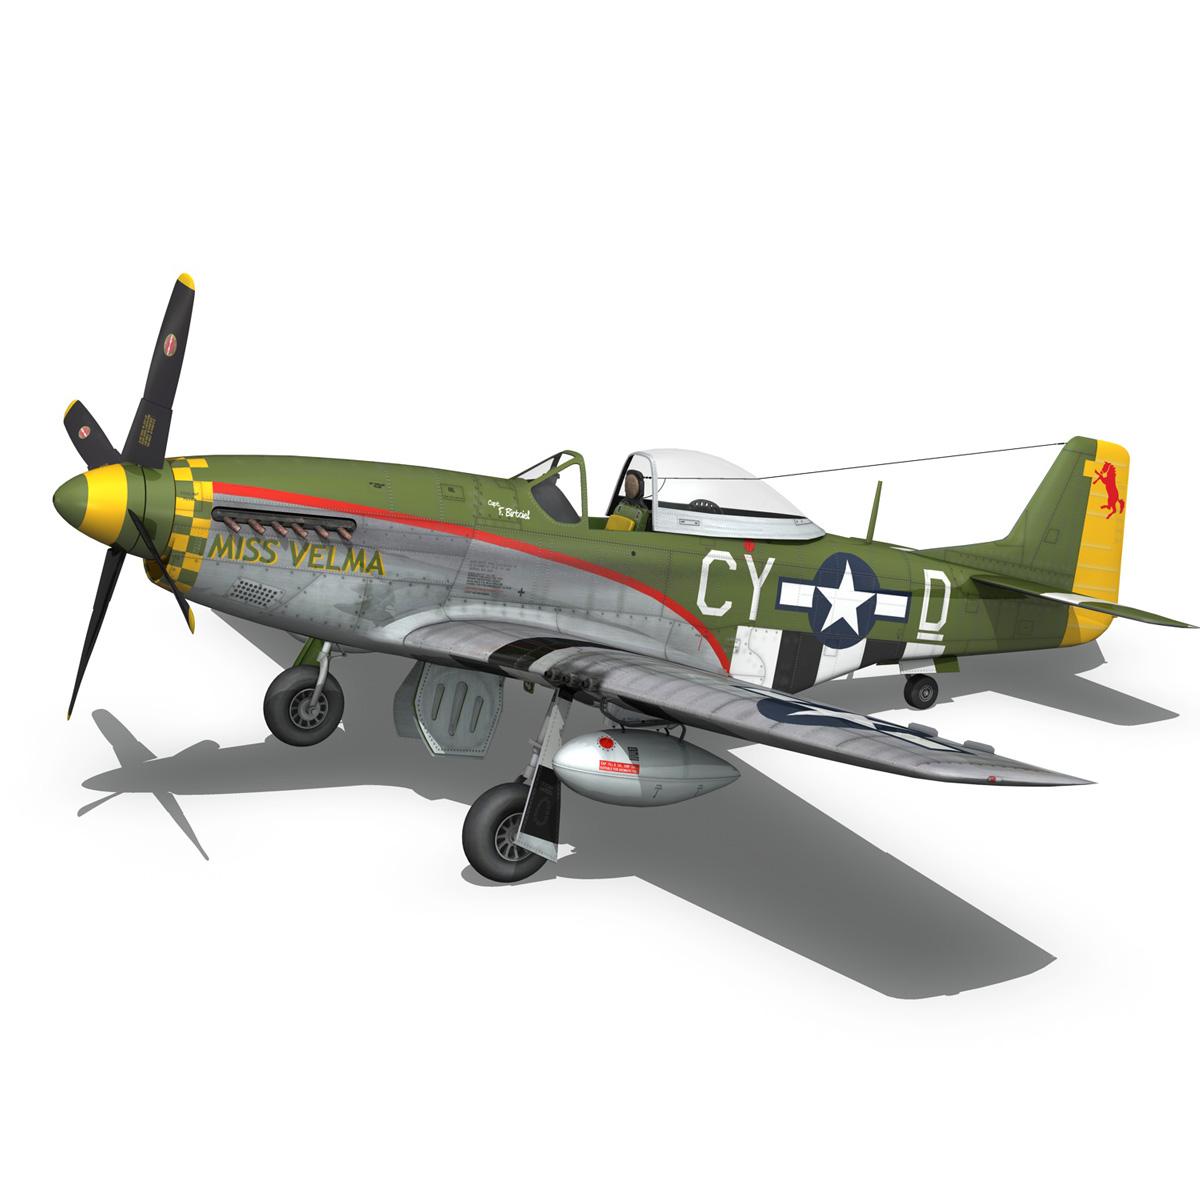 north american p-51d – mustang – miss velma 3d model 3ds fbx c4d lwo obj 267627